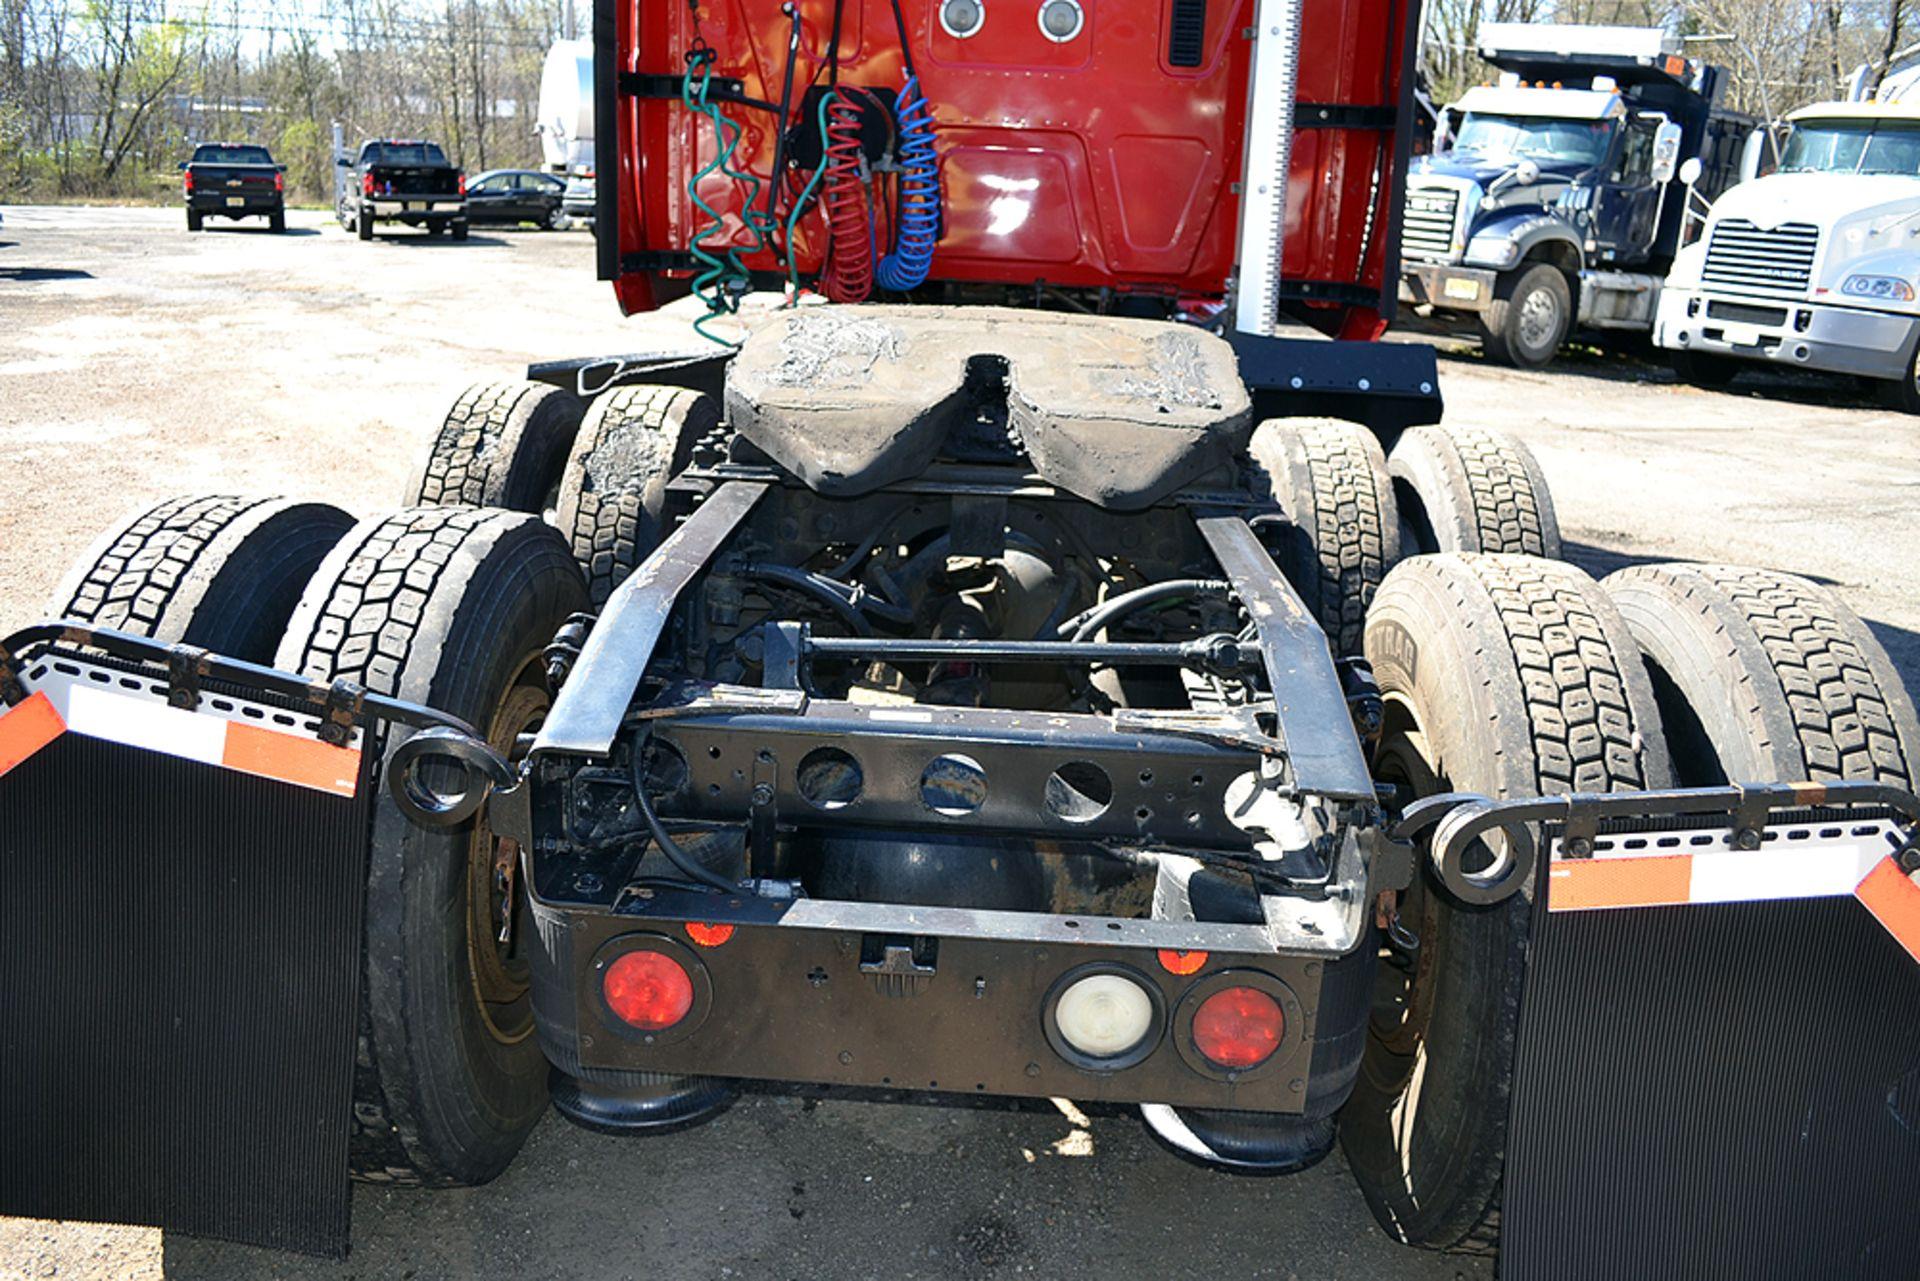 Lot 12 - 2010 International Prostar, Sleeper Cab Tandem Axle, Truck Tractor